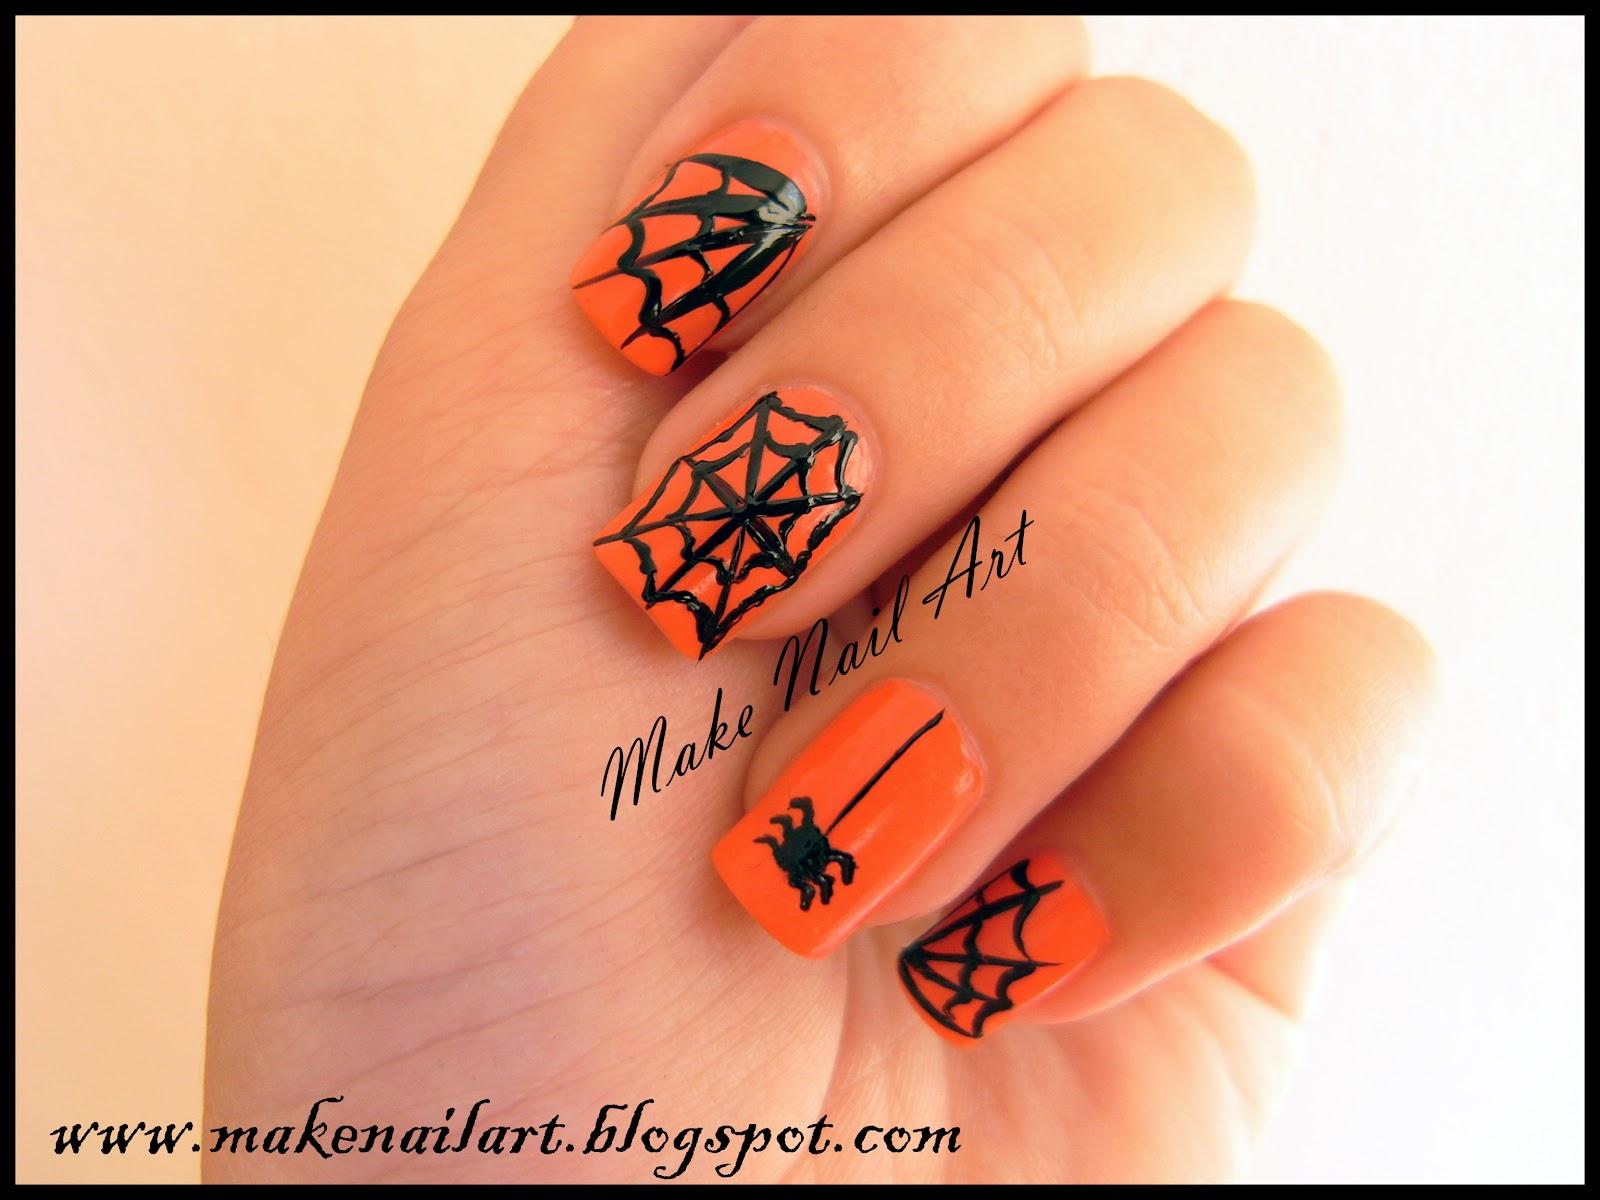 Make Nail Art: Spider Web Nail Art Tutorial For Halloween